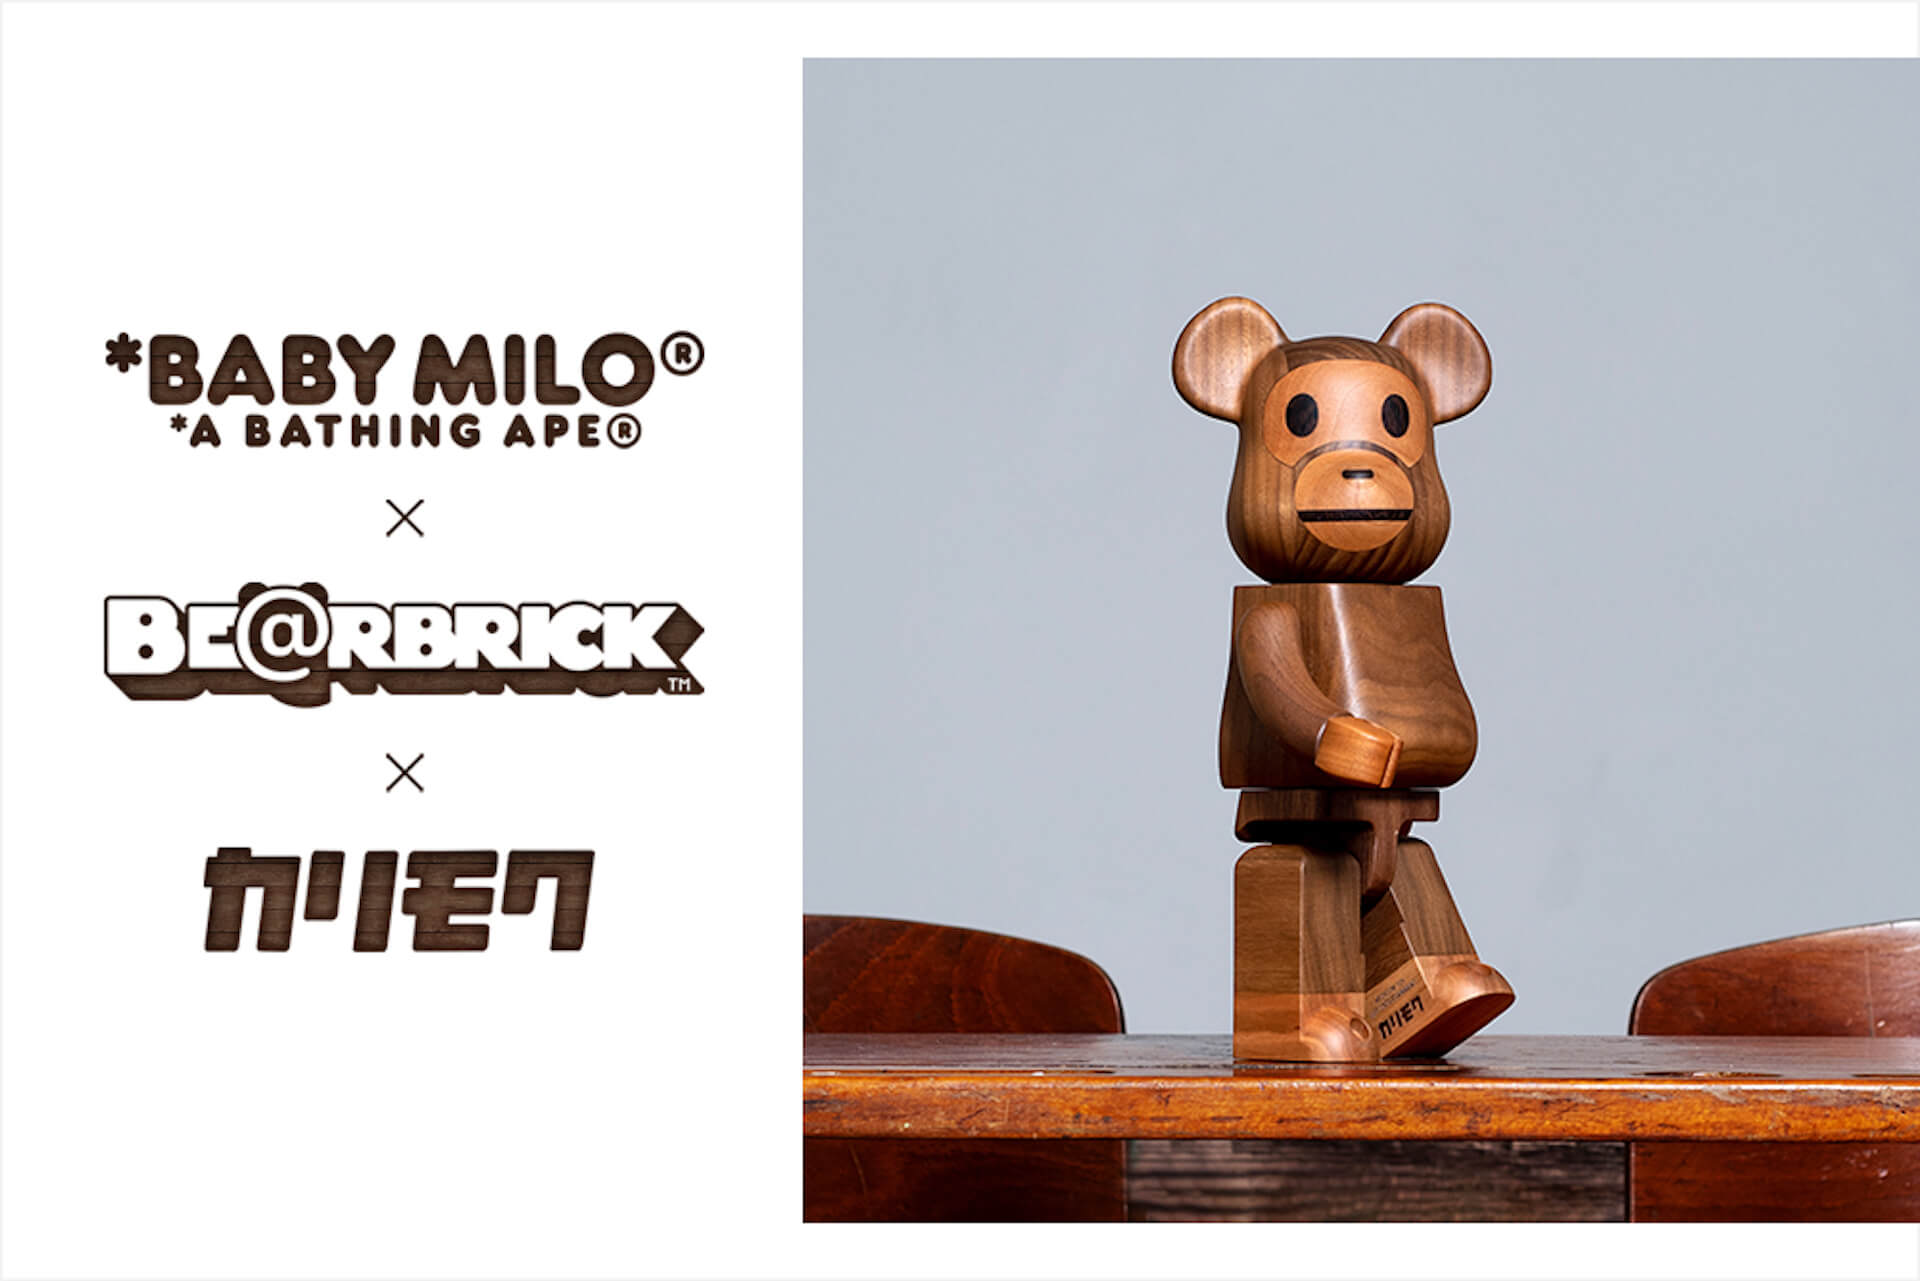 A BATHING APE(R)×カリモク×メディコム・トイのトリプルコラボ!BABY MILO(R)の木製BE@RBRICKが登場 ac200526_bearbrick_01